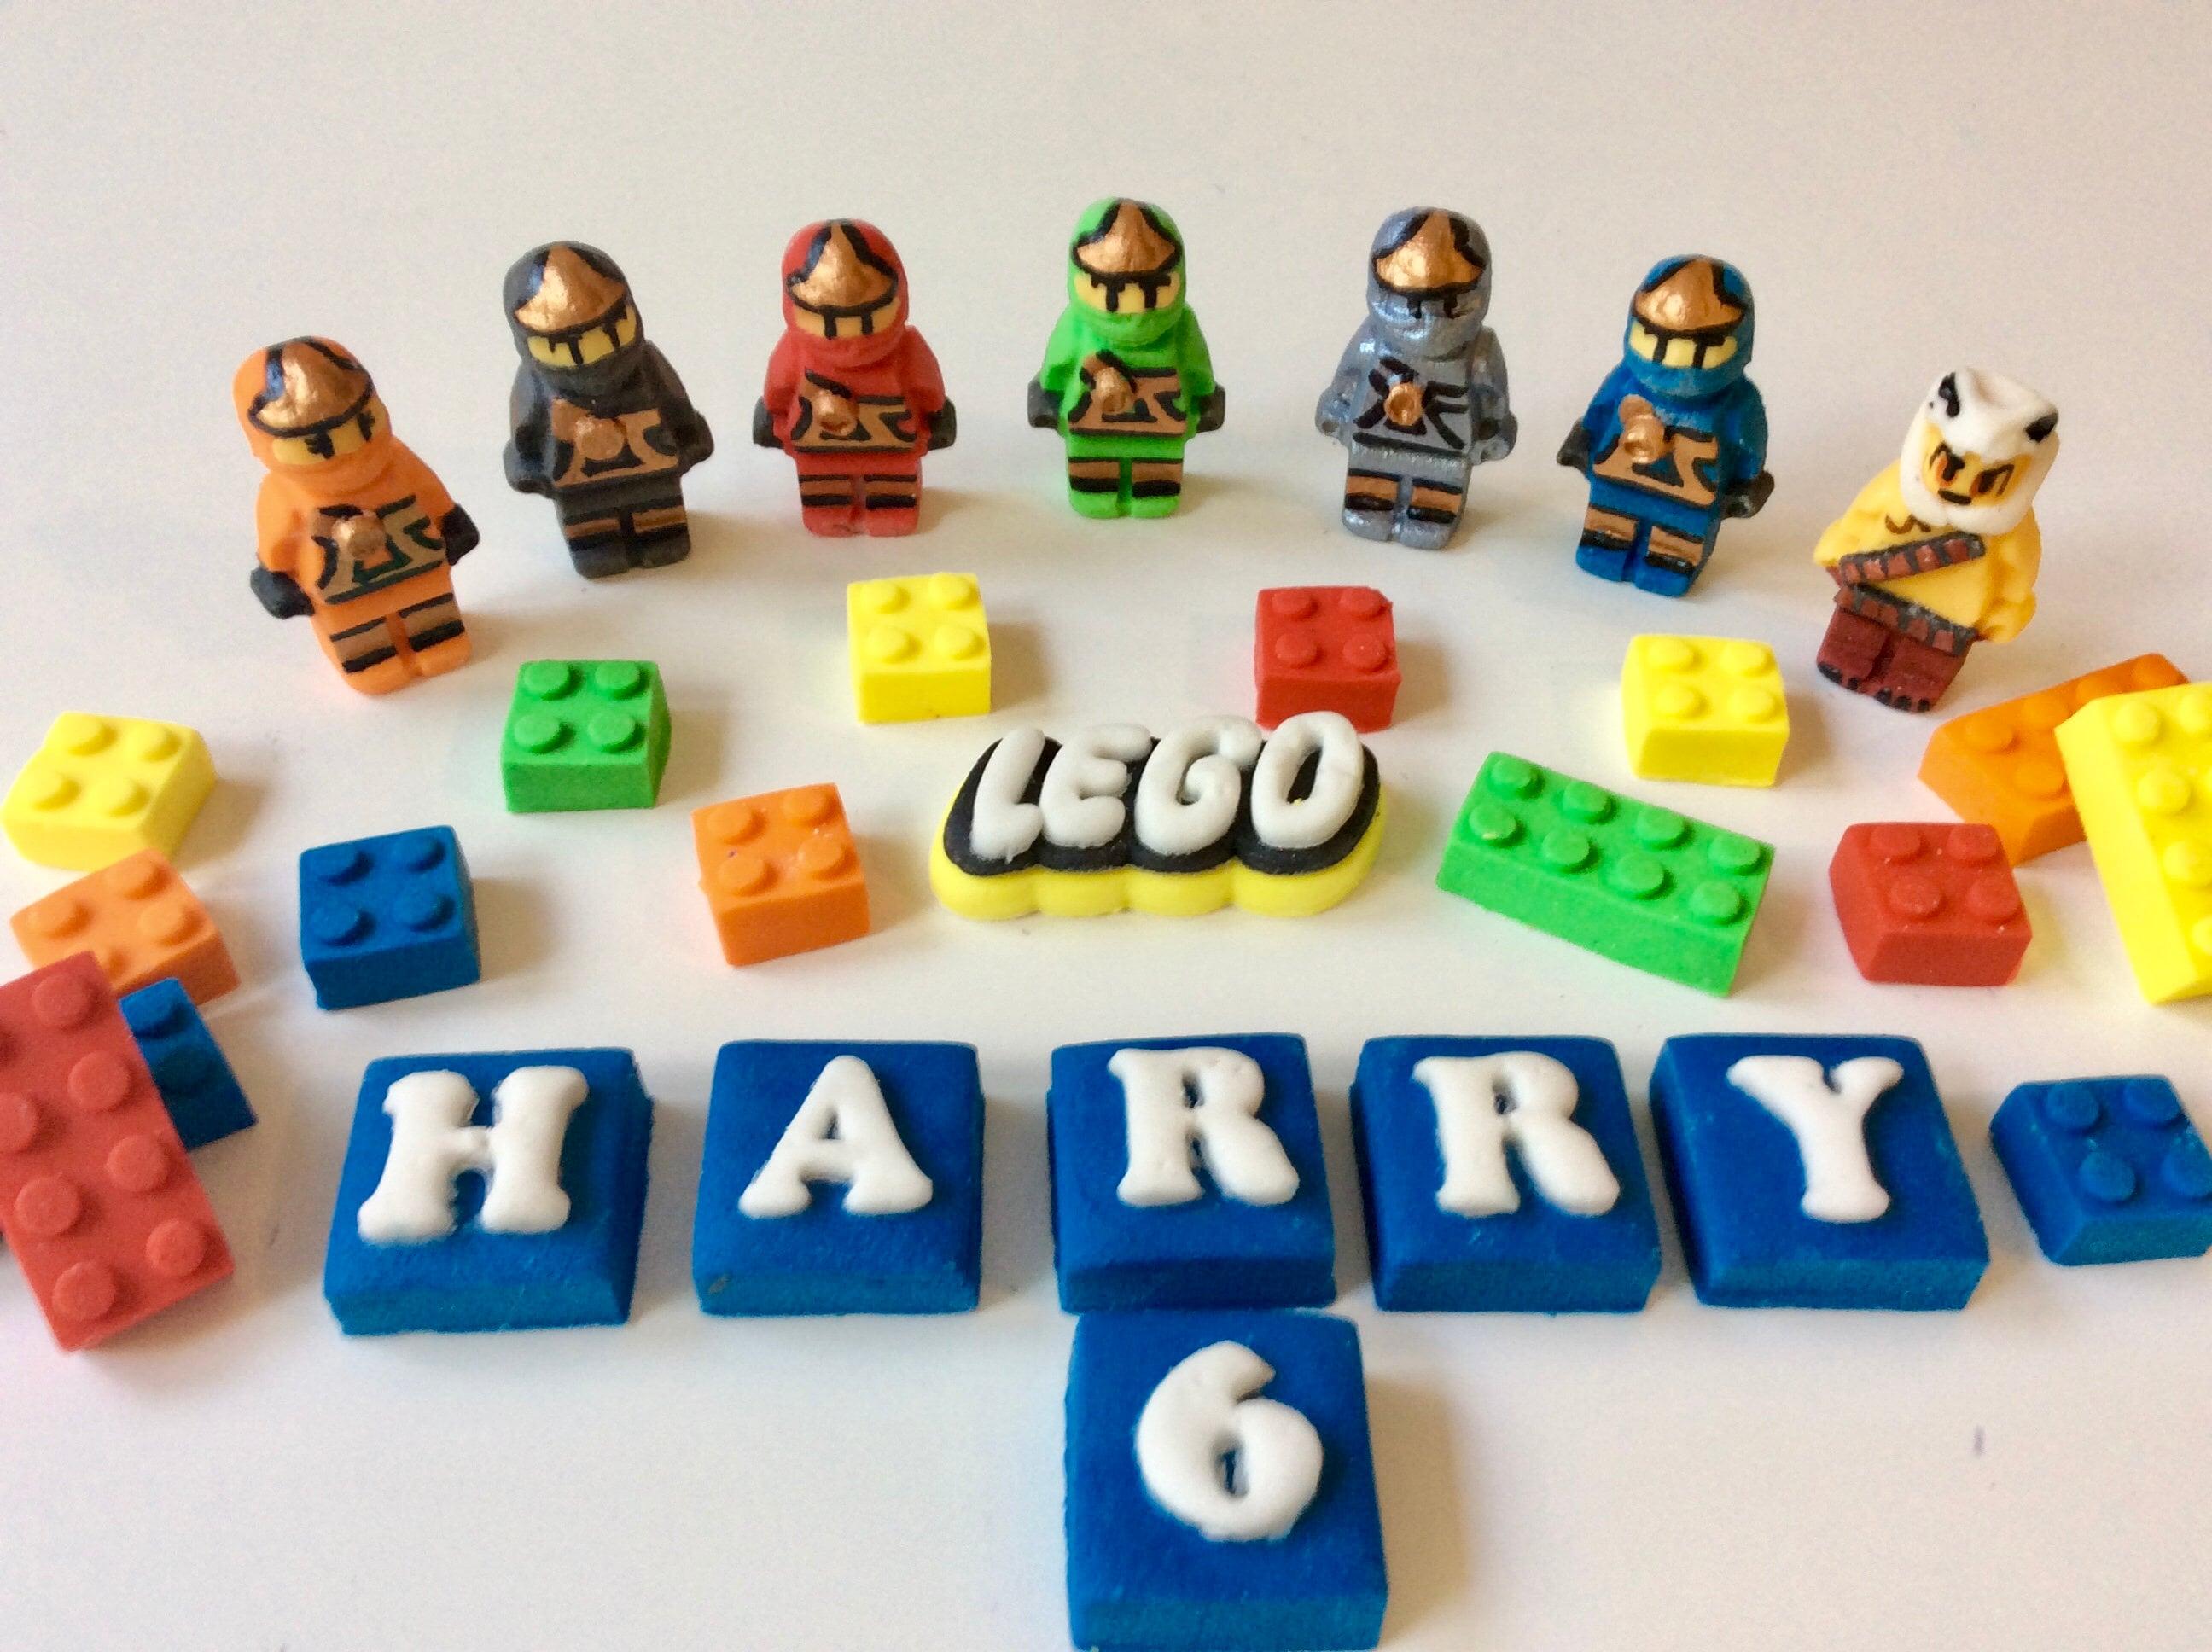 Kochen & Genießen Edible Fondant Lego Ninjago & Bricks Cake Topper Birthday  Decorations Möbel & Wohnen pogio.be